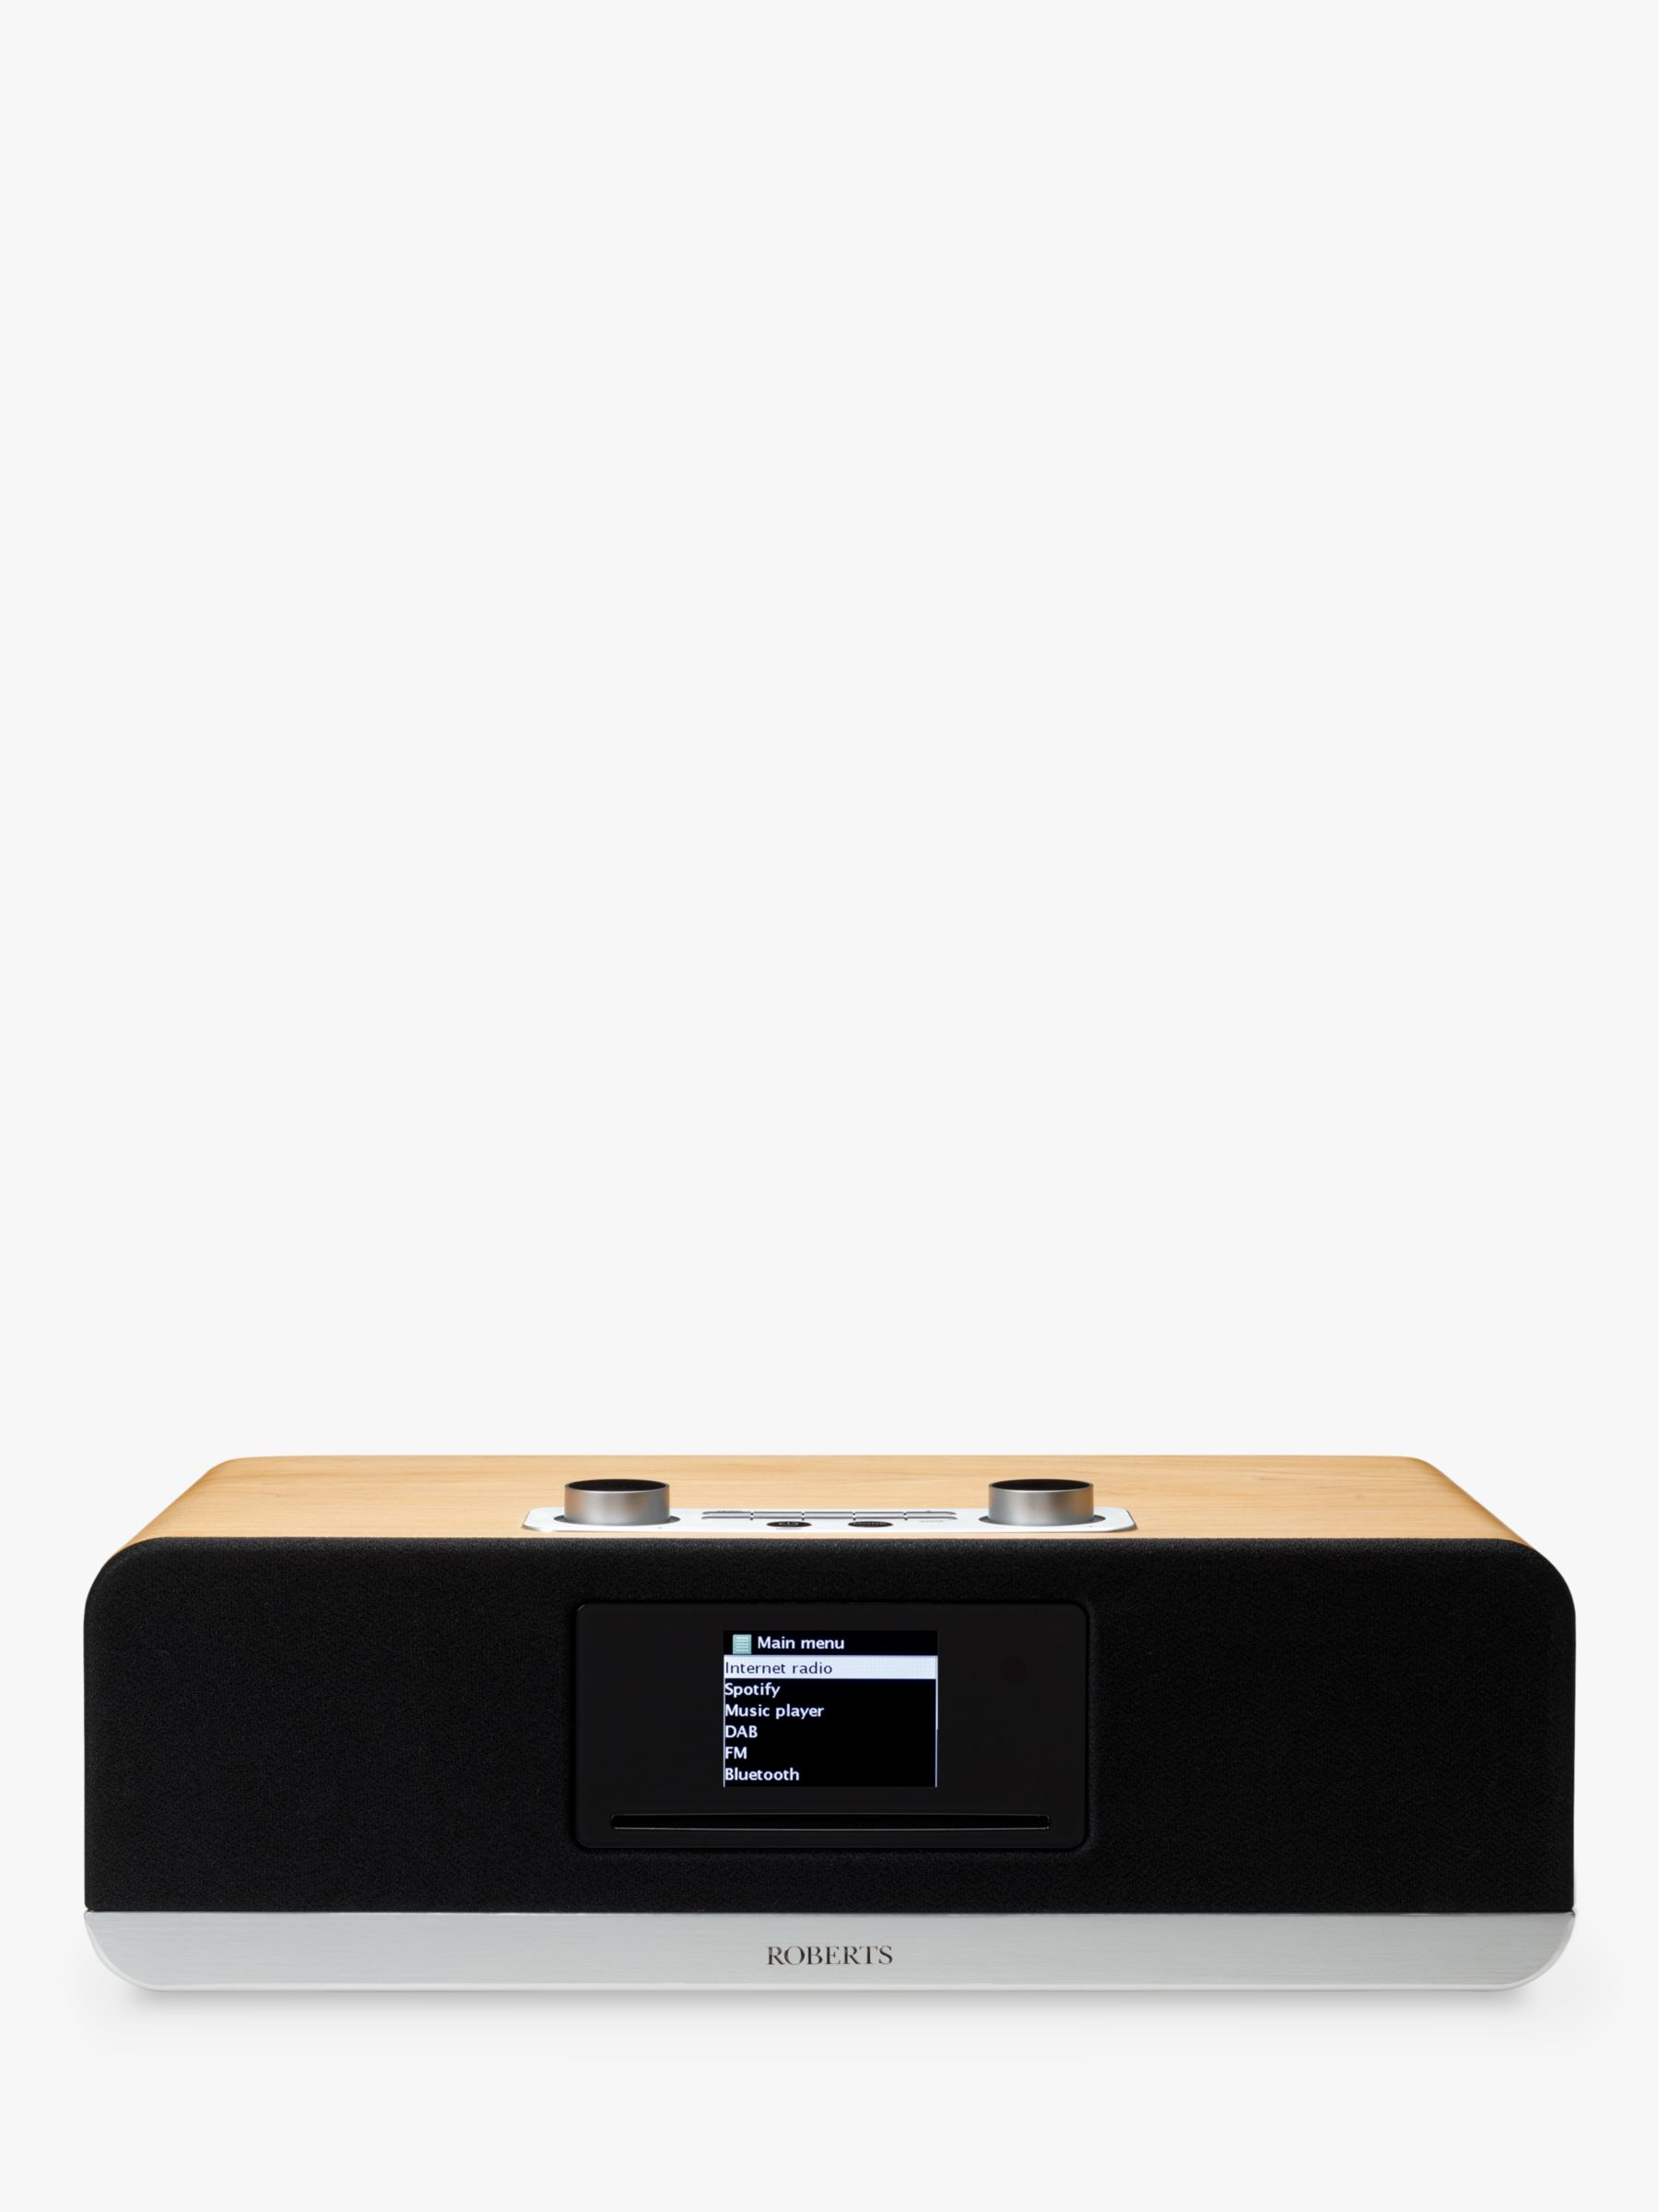 Roberts ROBERTS Stream 67 DAB+/FM/Internet Radio Wi-Fi Bluetooth All-In-One Smart Music System